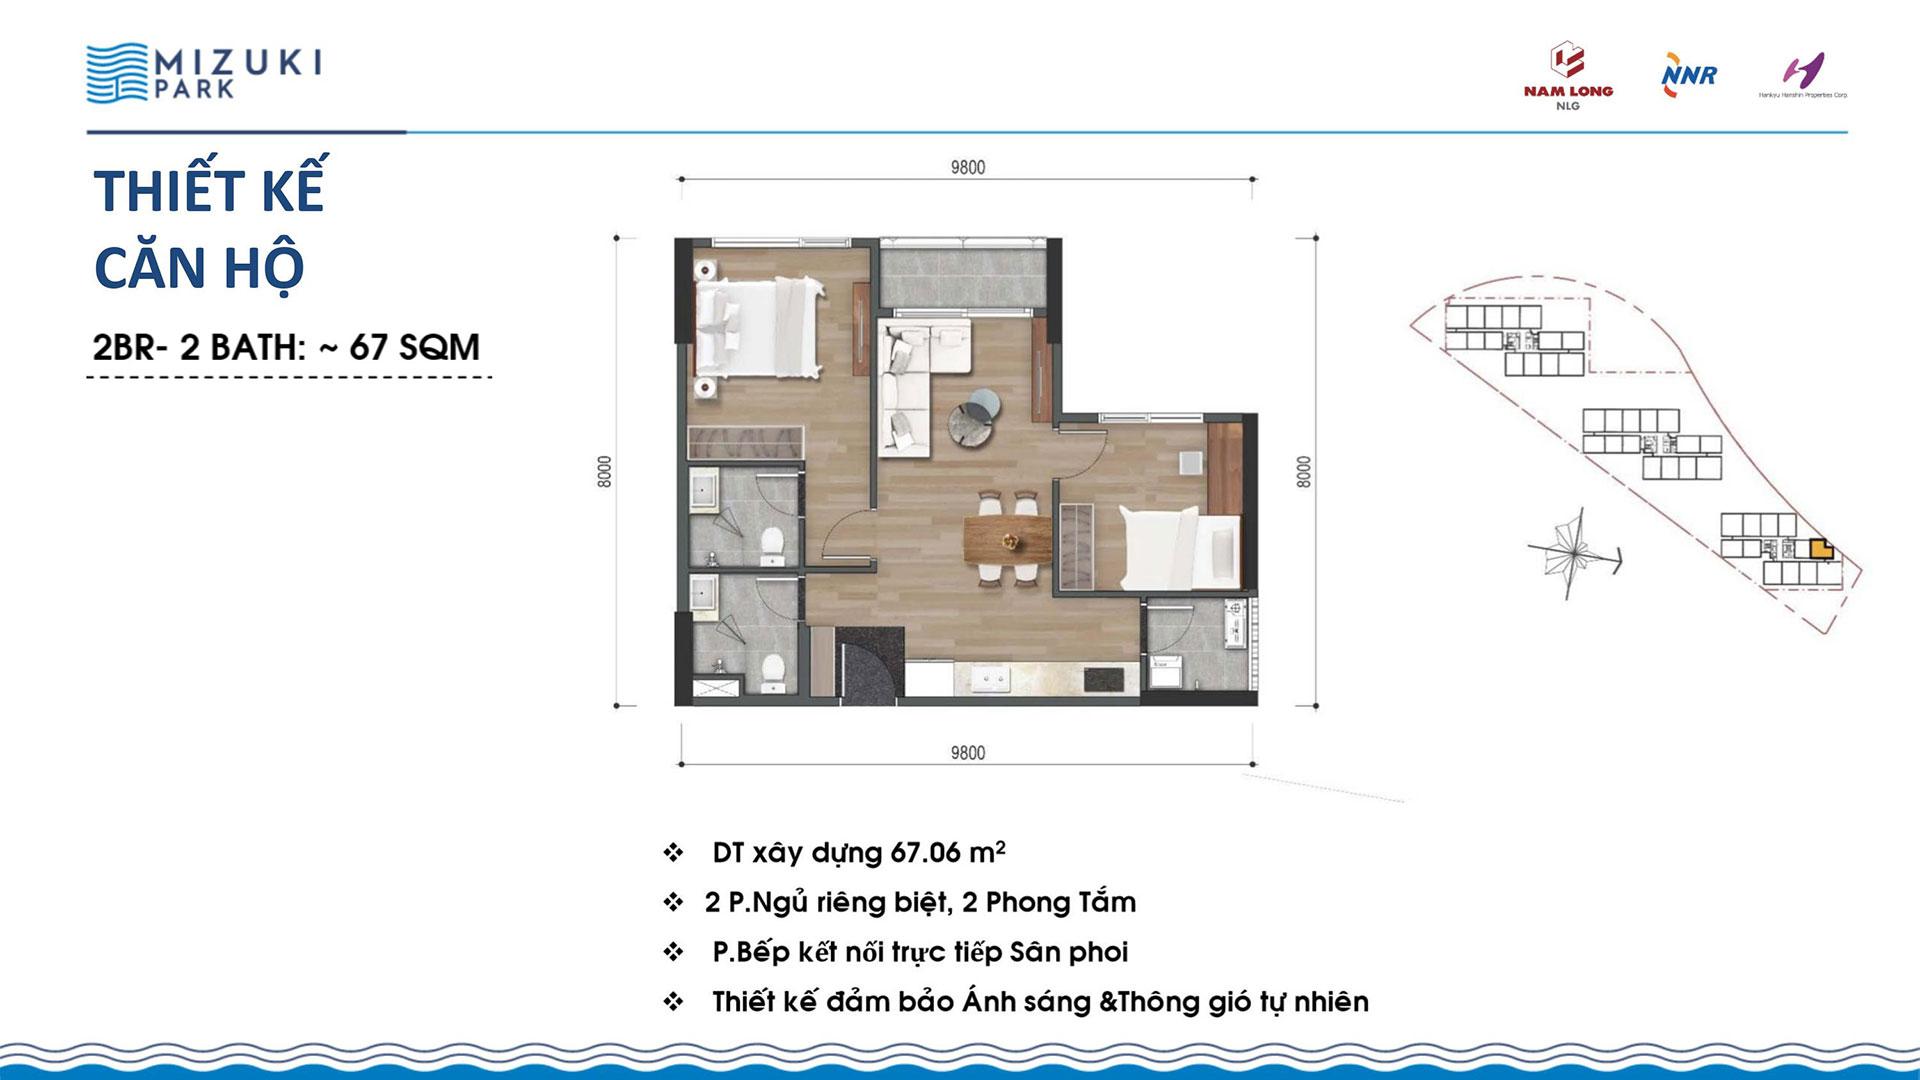 Thiết kế căn hộ Mizuki Park 67m2